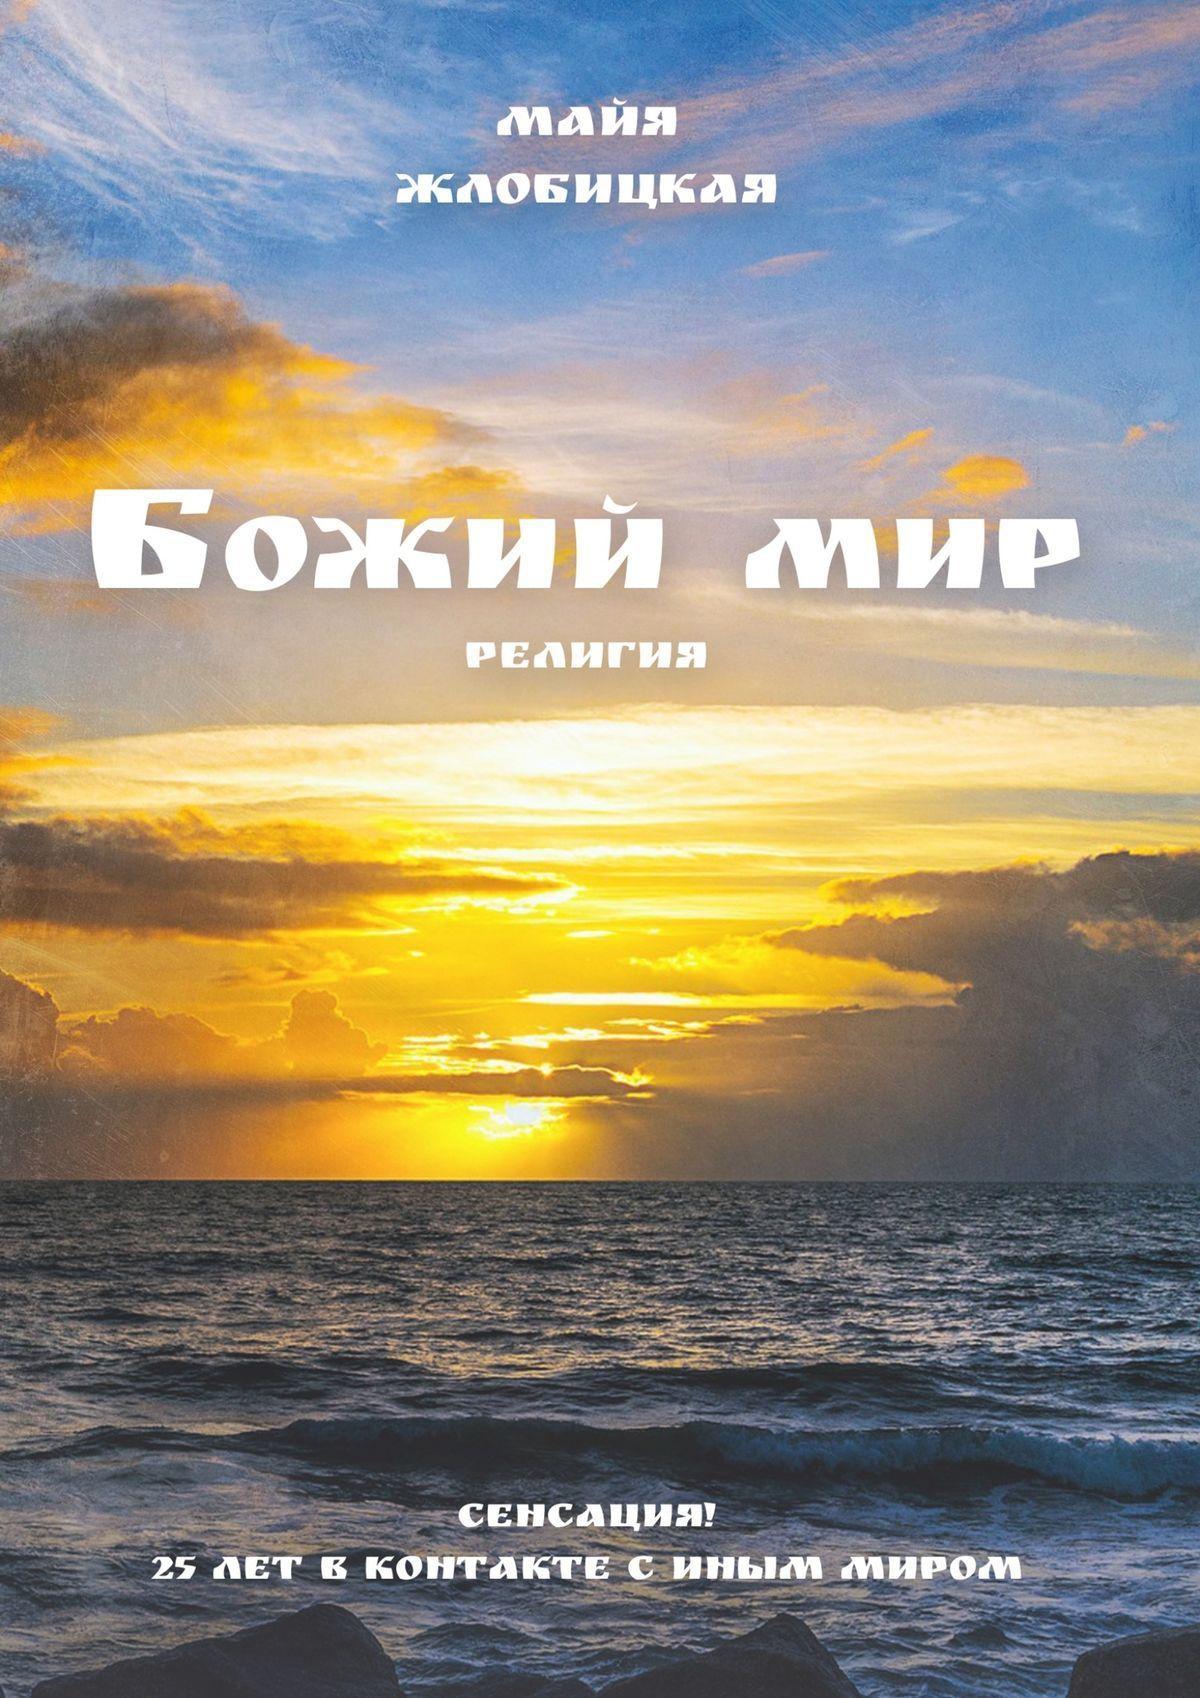 Майя Борисовна Жлобицкая Божий мир